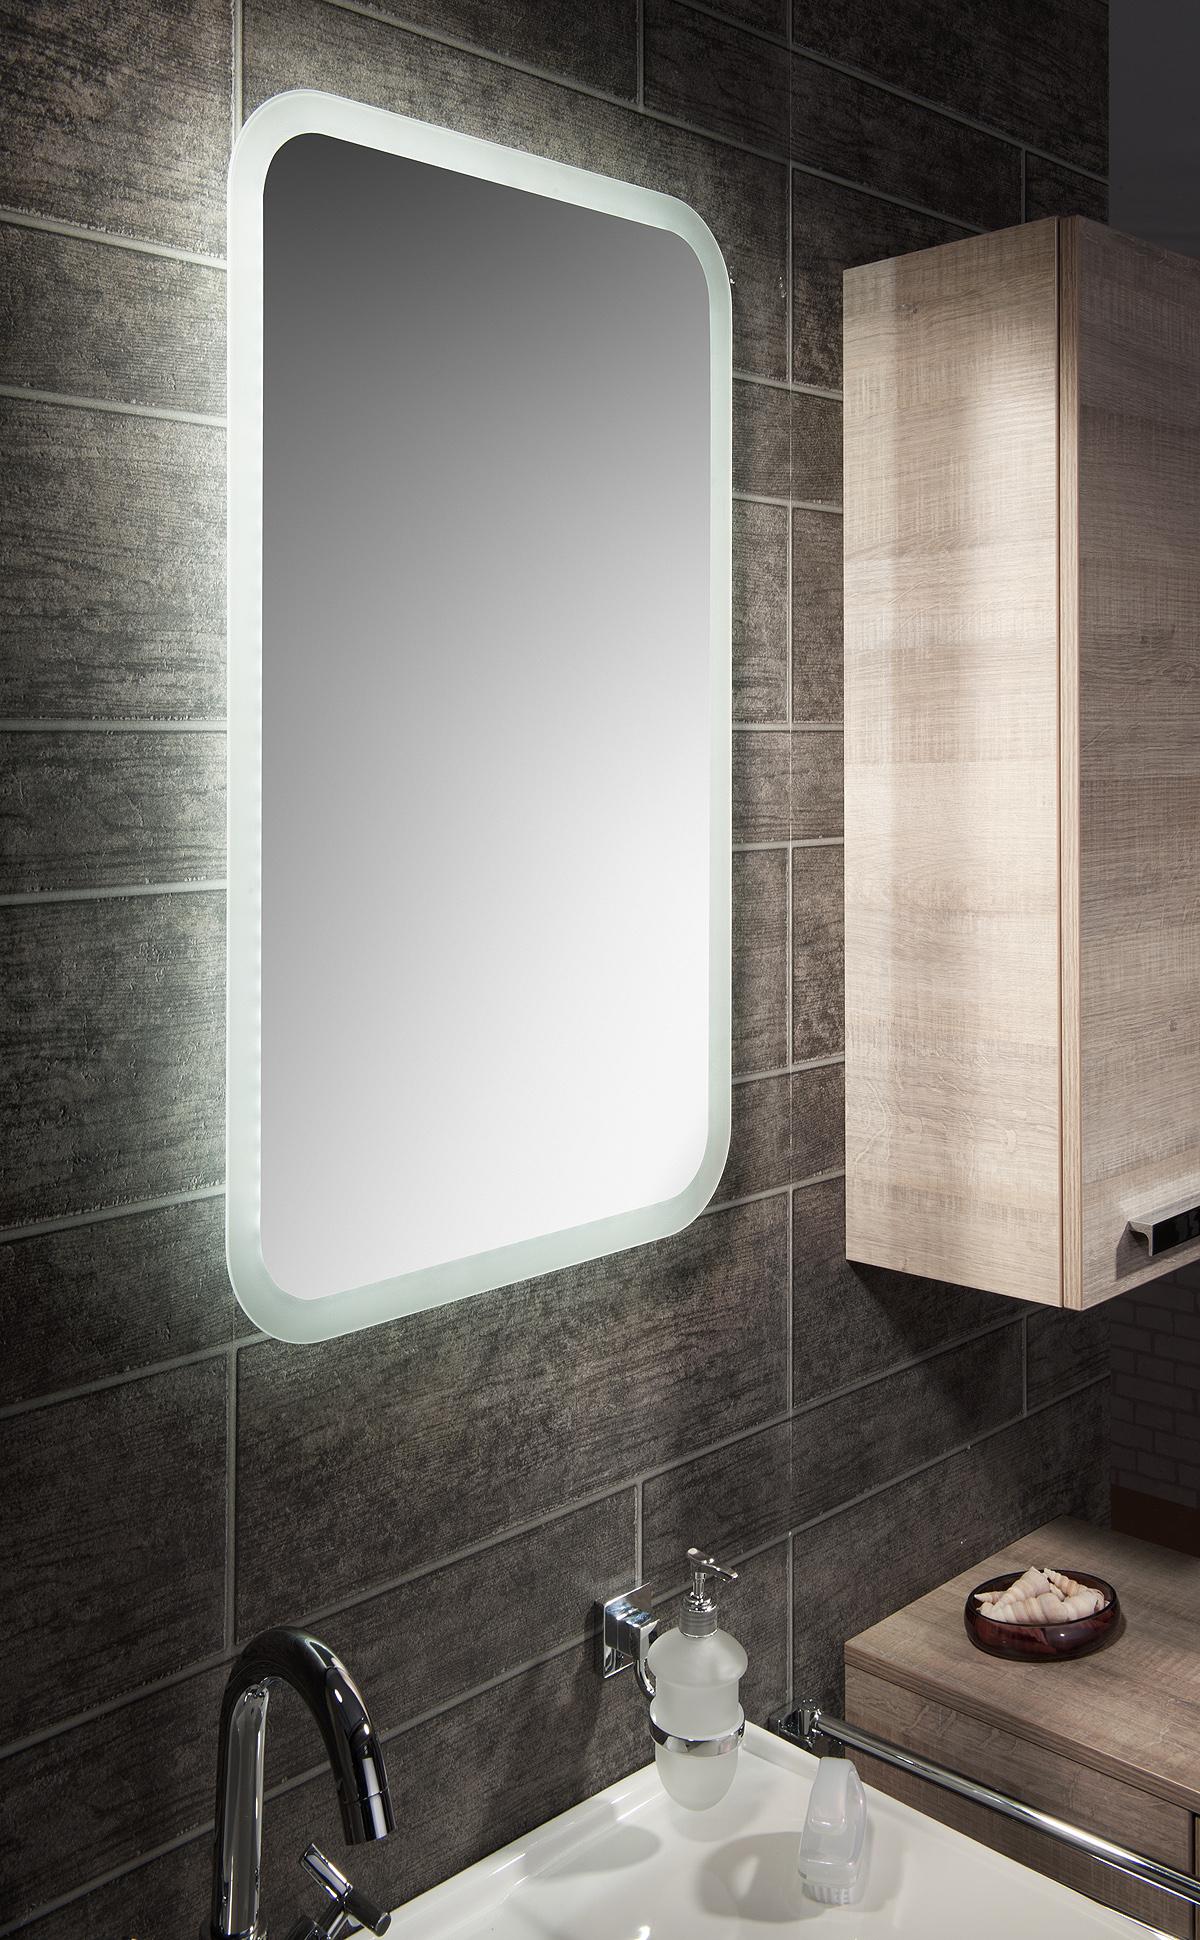 schulz badprofi fackelmann led spiegelelement 45. Black Bedroom Furniture Sets. Home Design Ideas